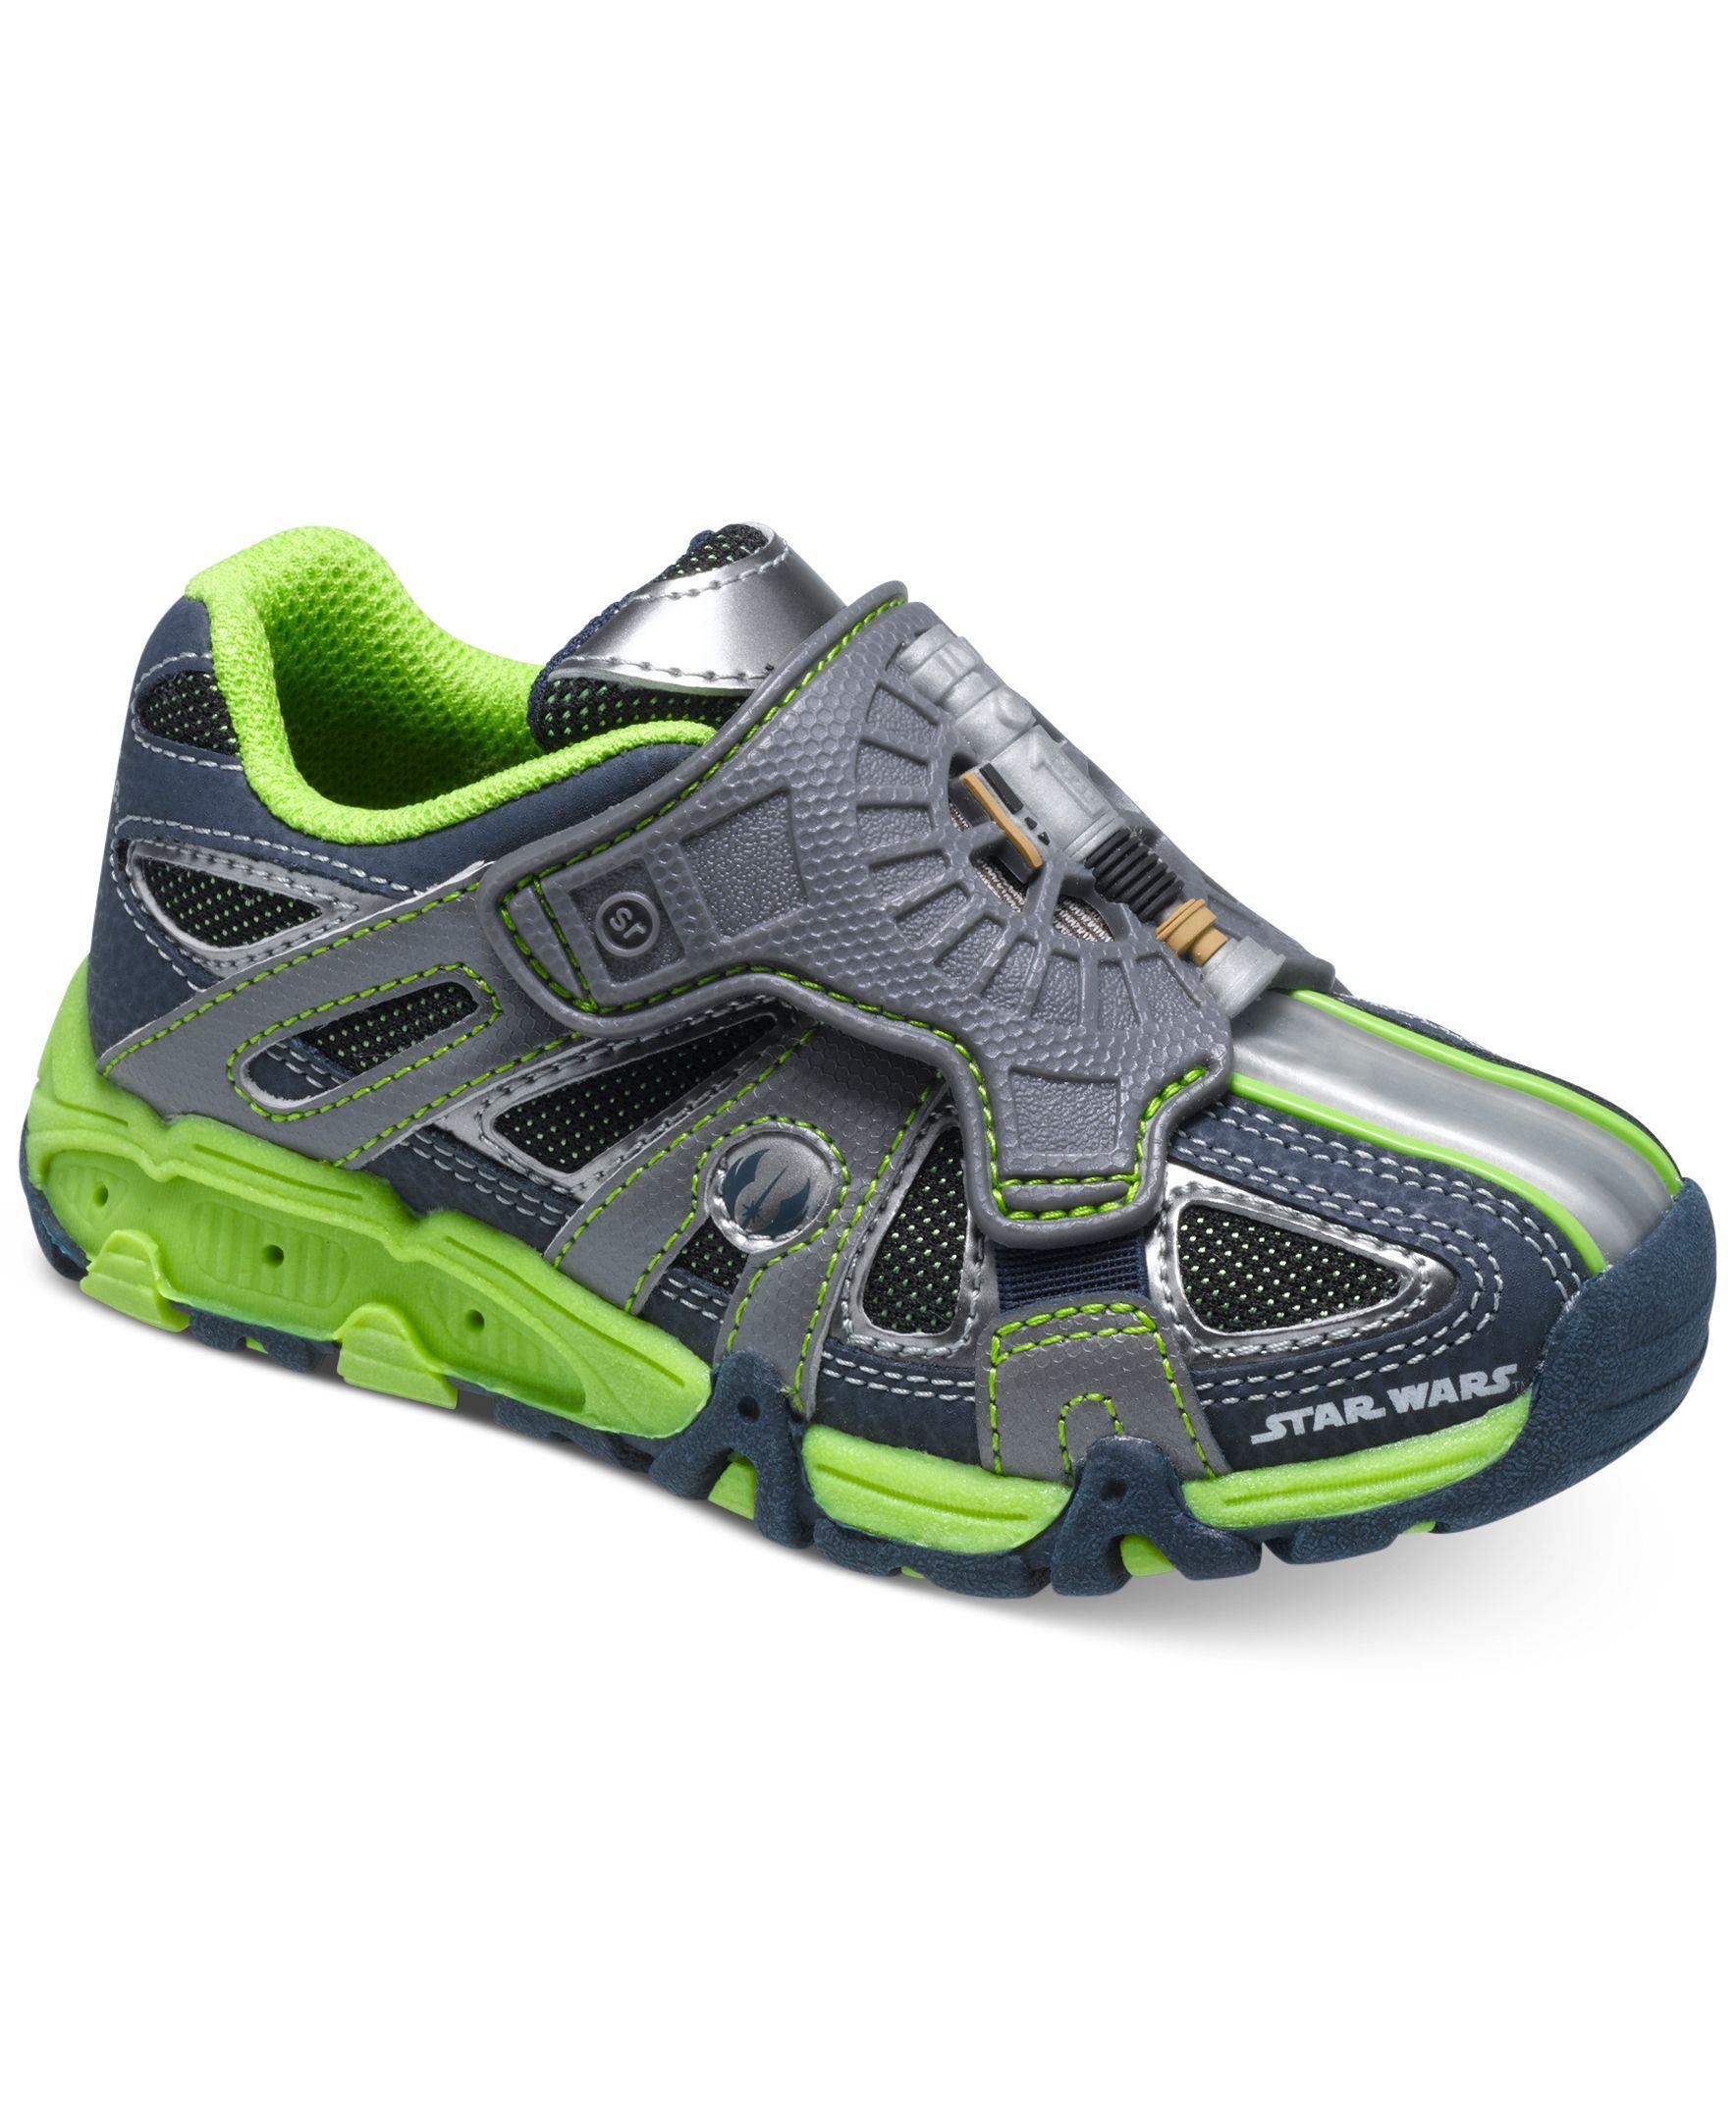 bcb3e4f3afa215 Stride Rite Little Boys  or Toddler Boys  Star Wars Light Sound Lightsaber  Shoes